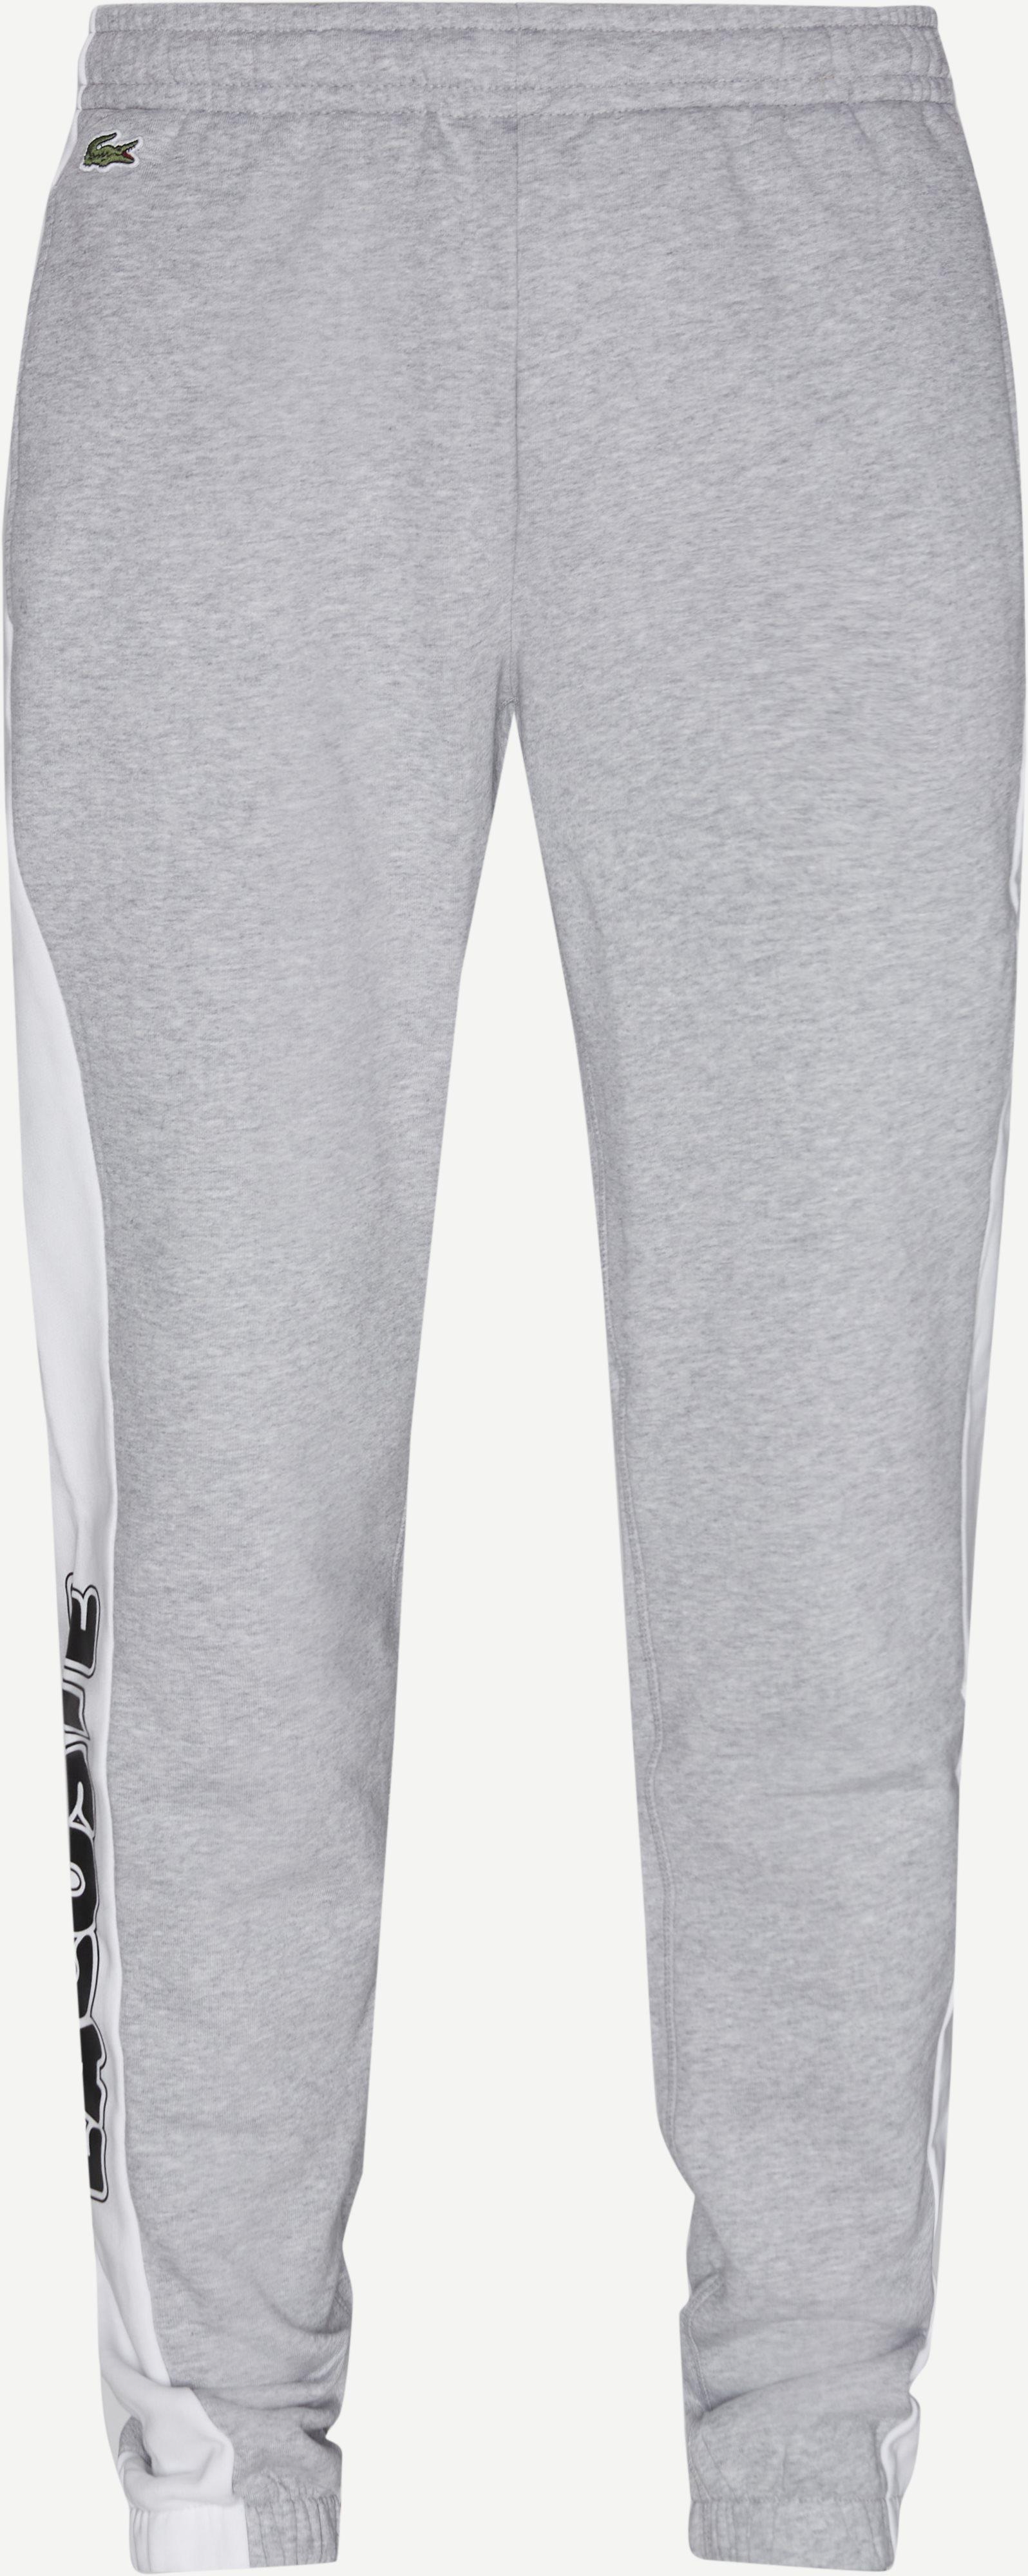 Bicolour Fleece Jogging Pants - Bukser - Regular - Grå